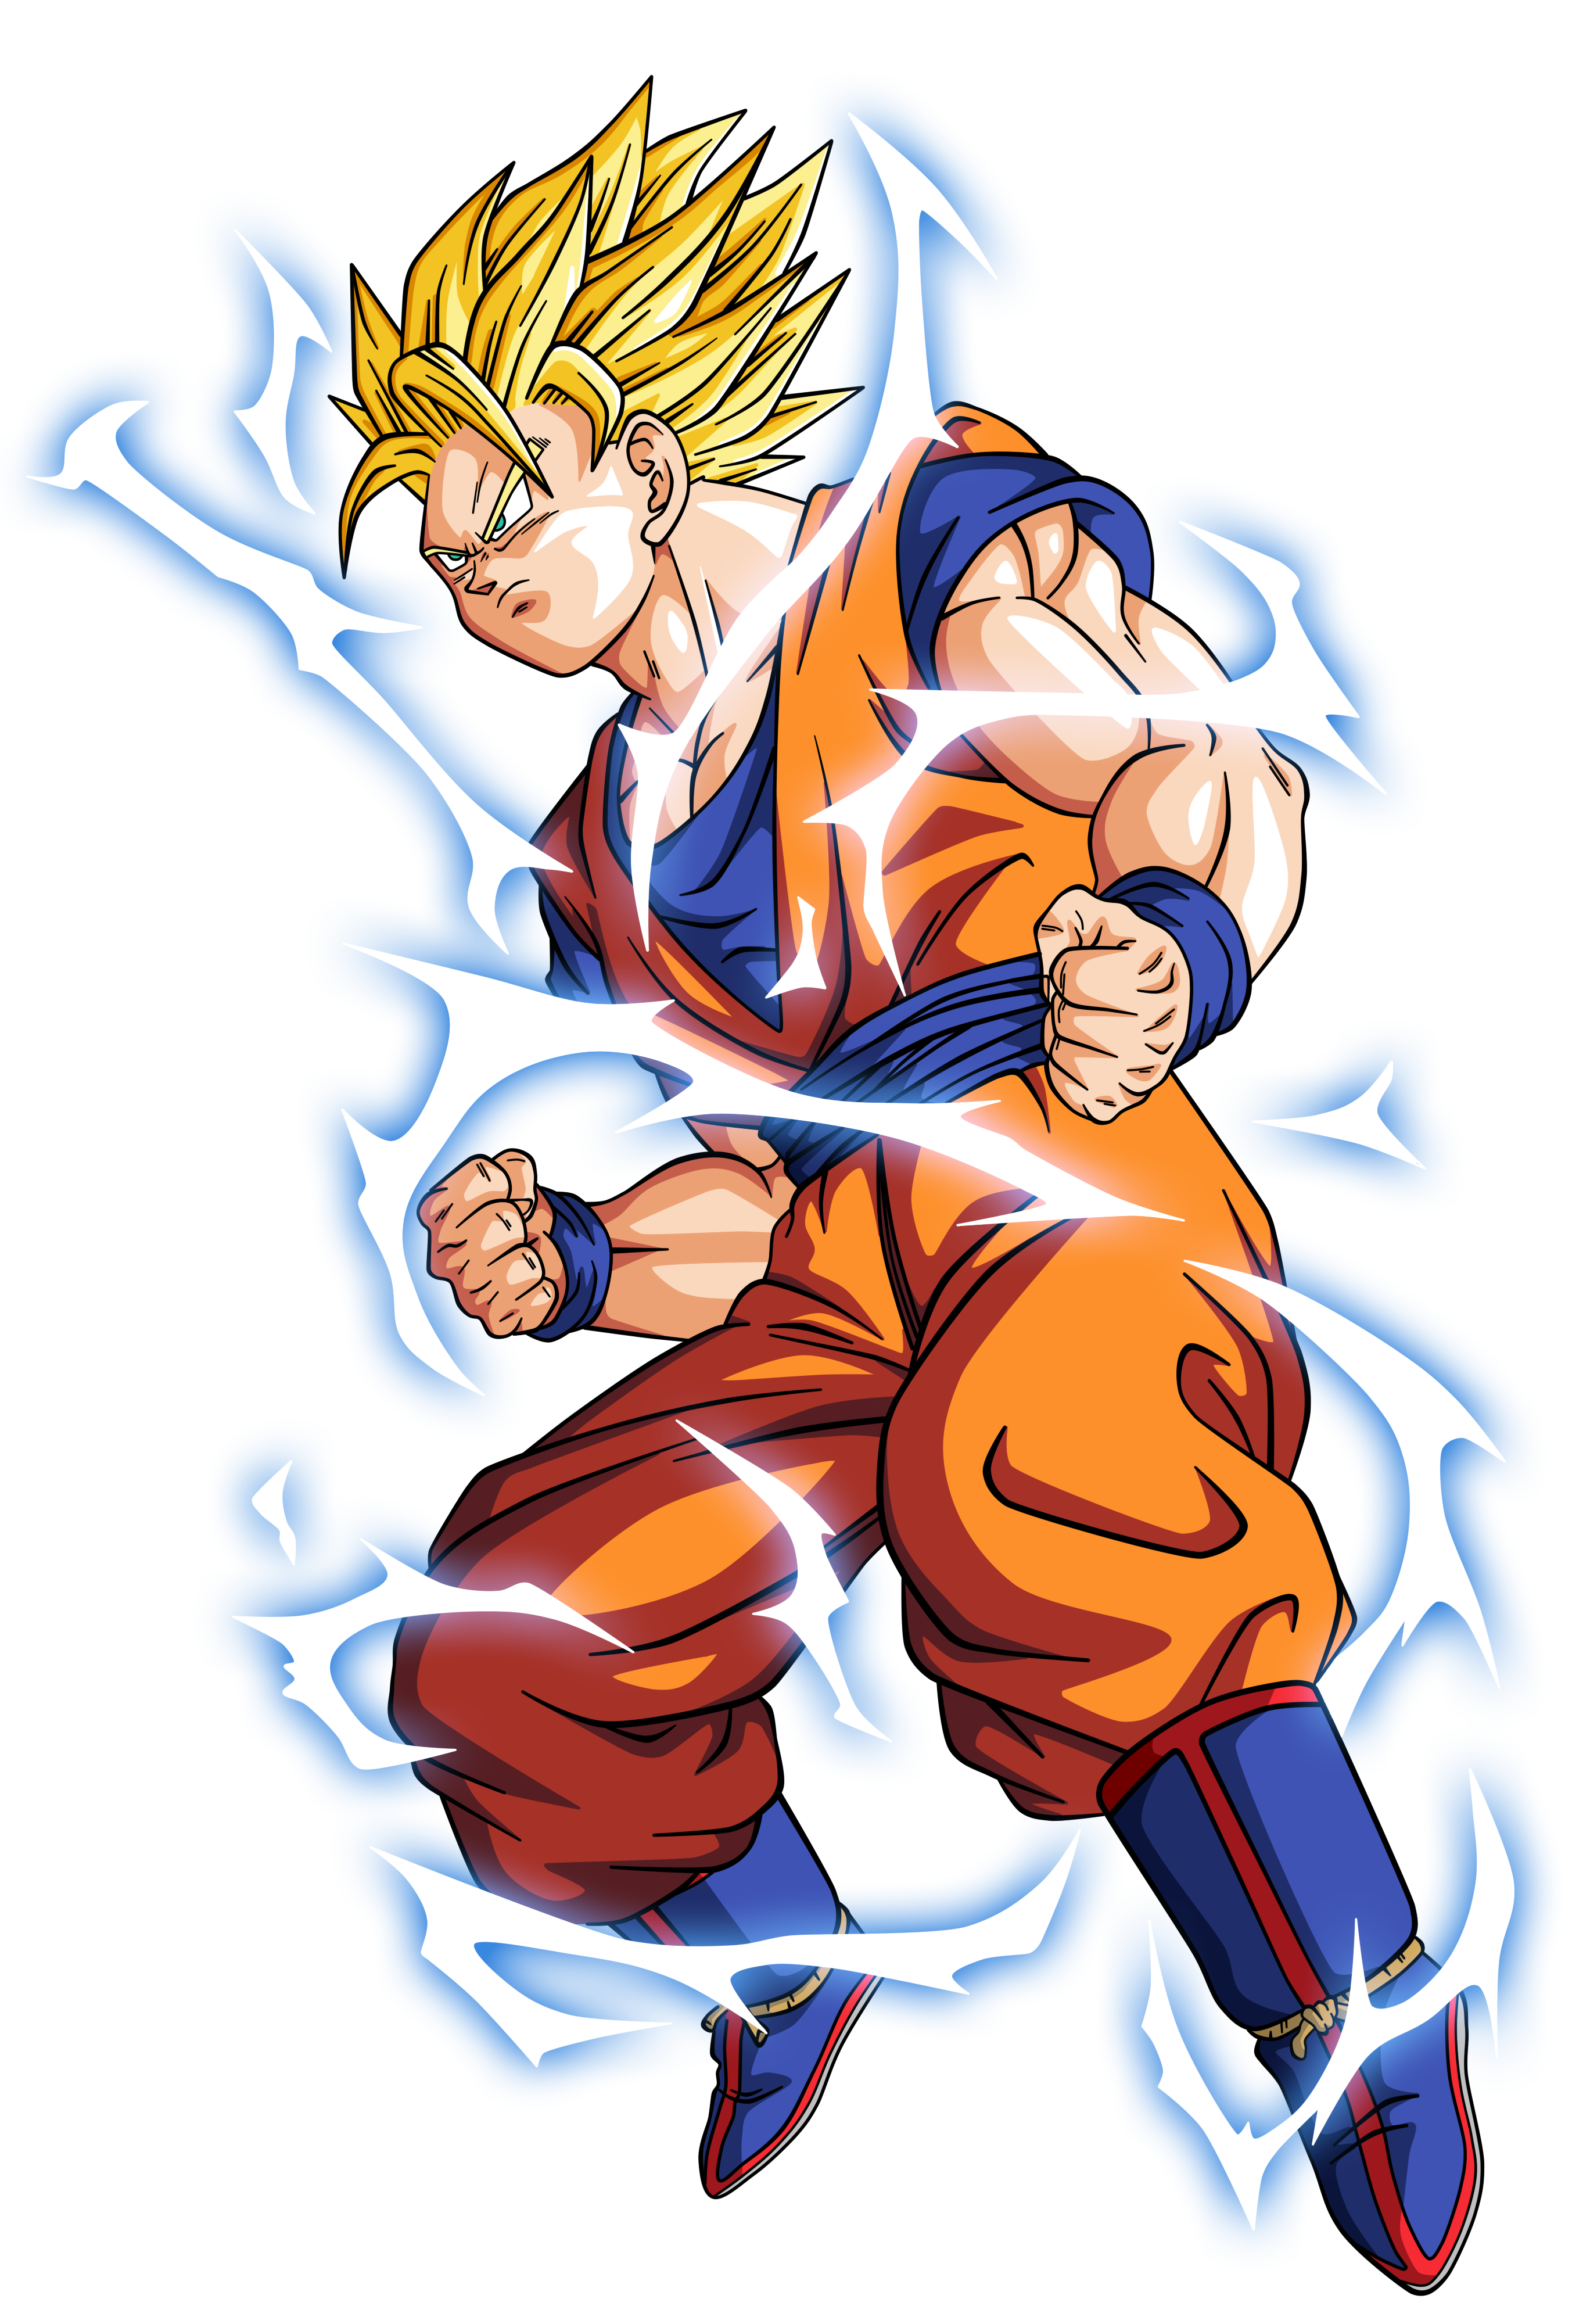 Os gusta el Super Saiyan God Super Saiyan? (SSGSS) - Dragon